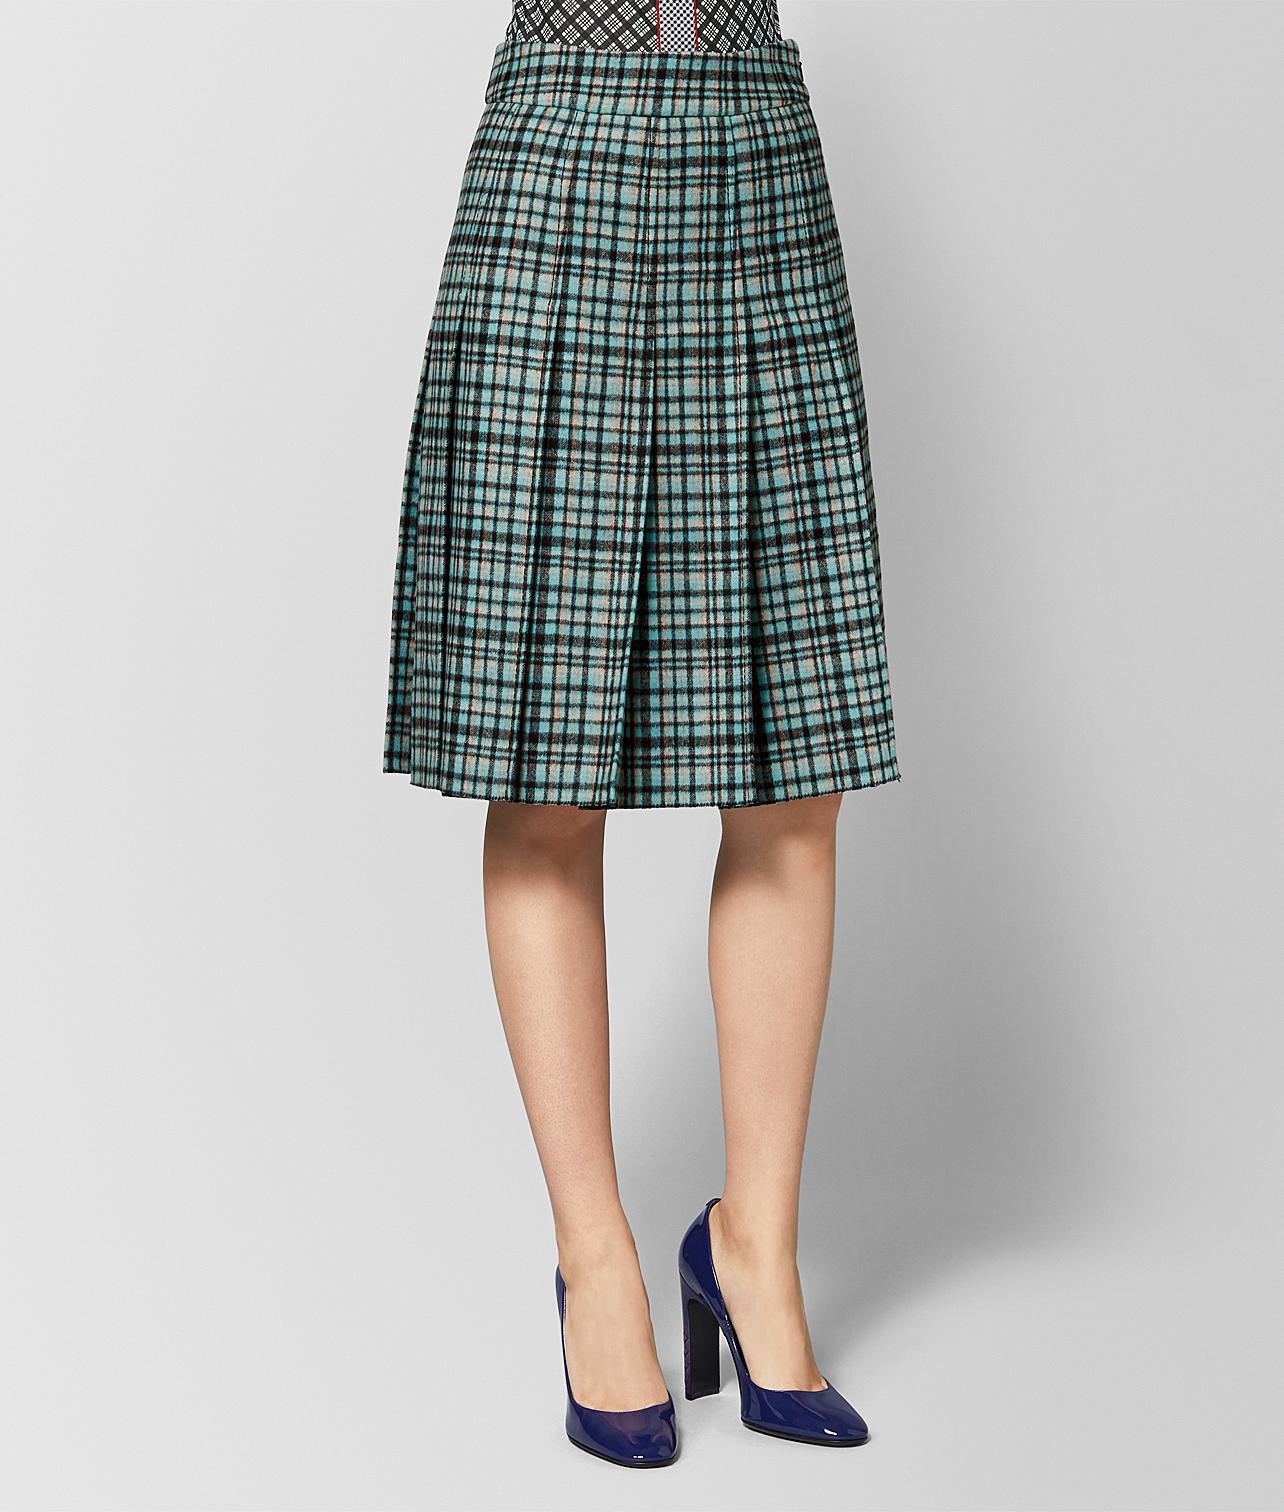 9cba147a95 Lyst - Bottega Veneta Aqua nero Wool Skirt